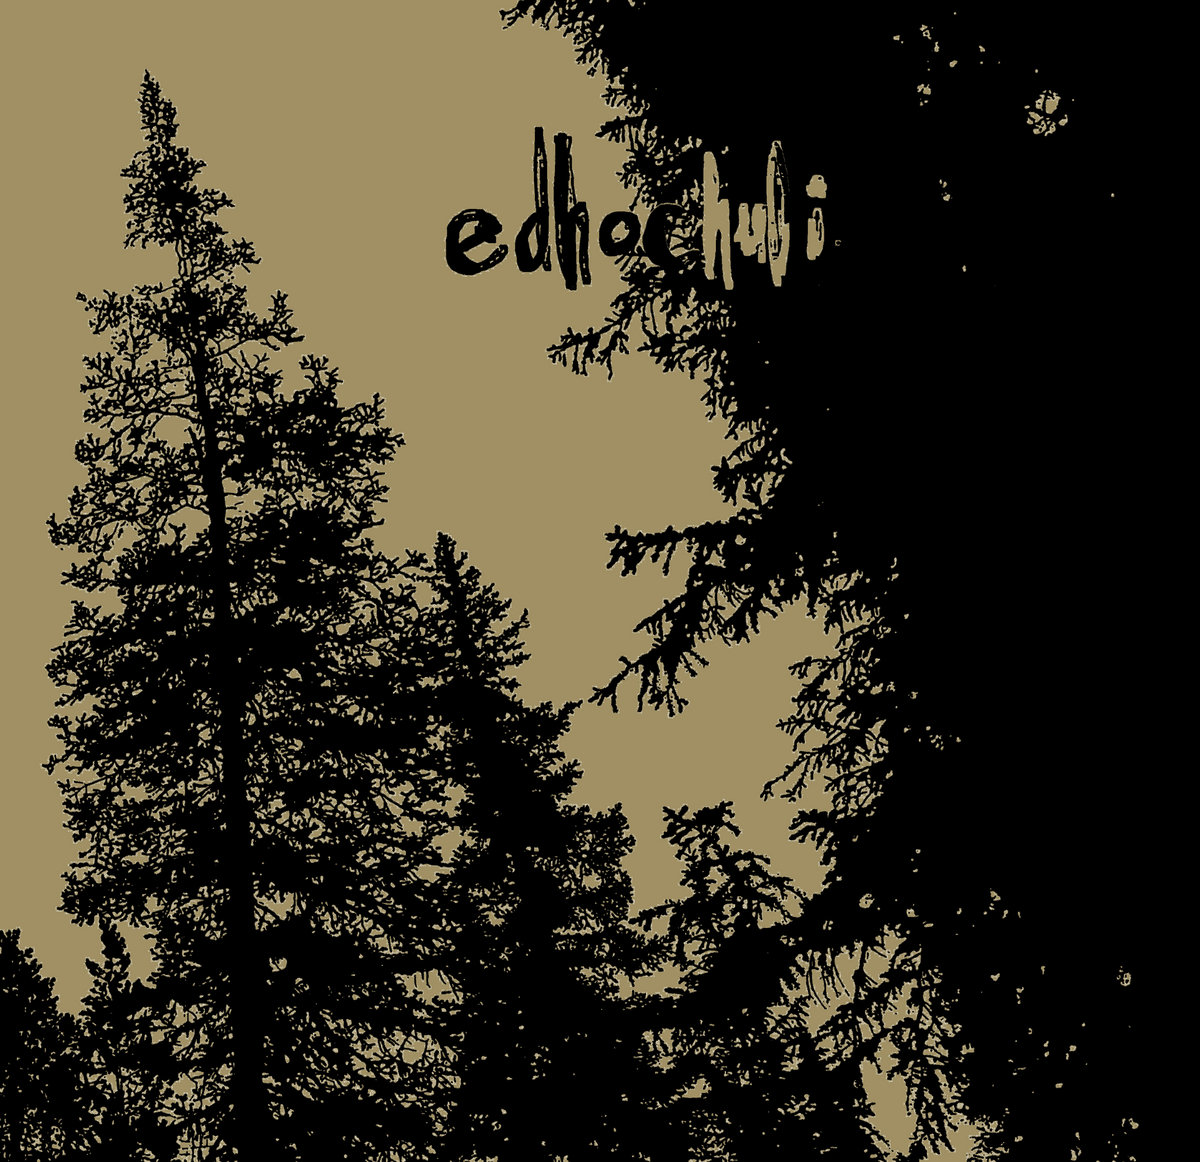 https://edhochuli.bandcamp.com/album/edhochuli-2013